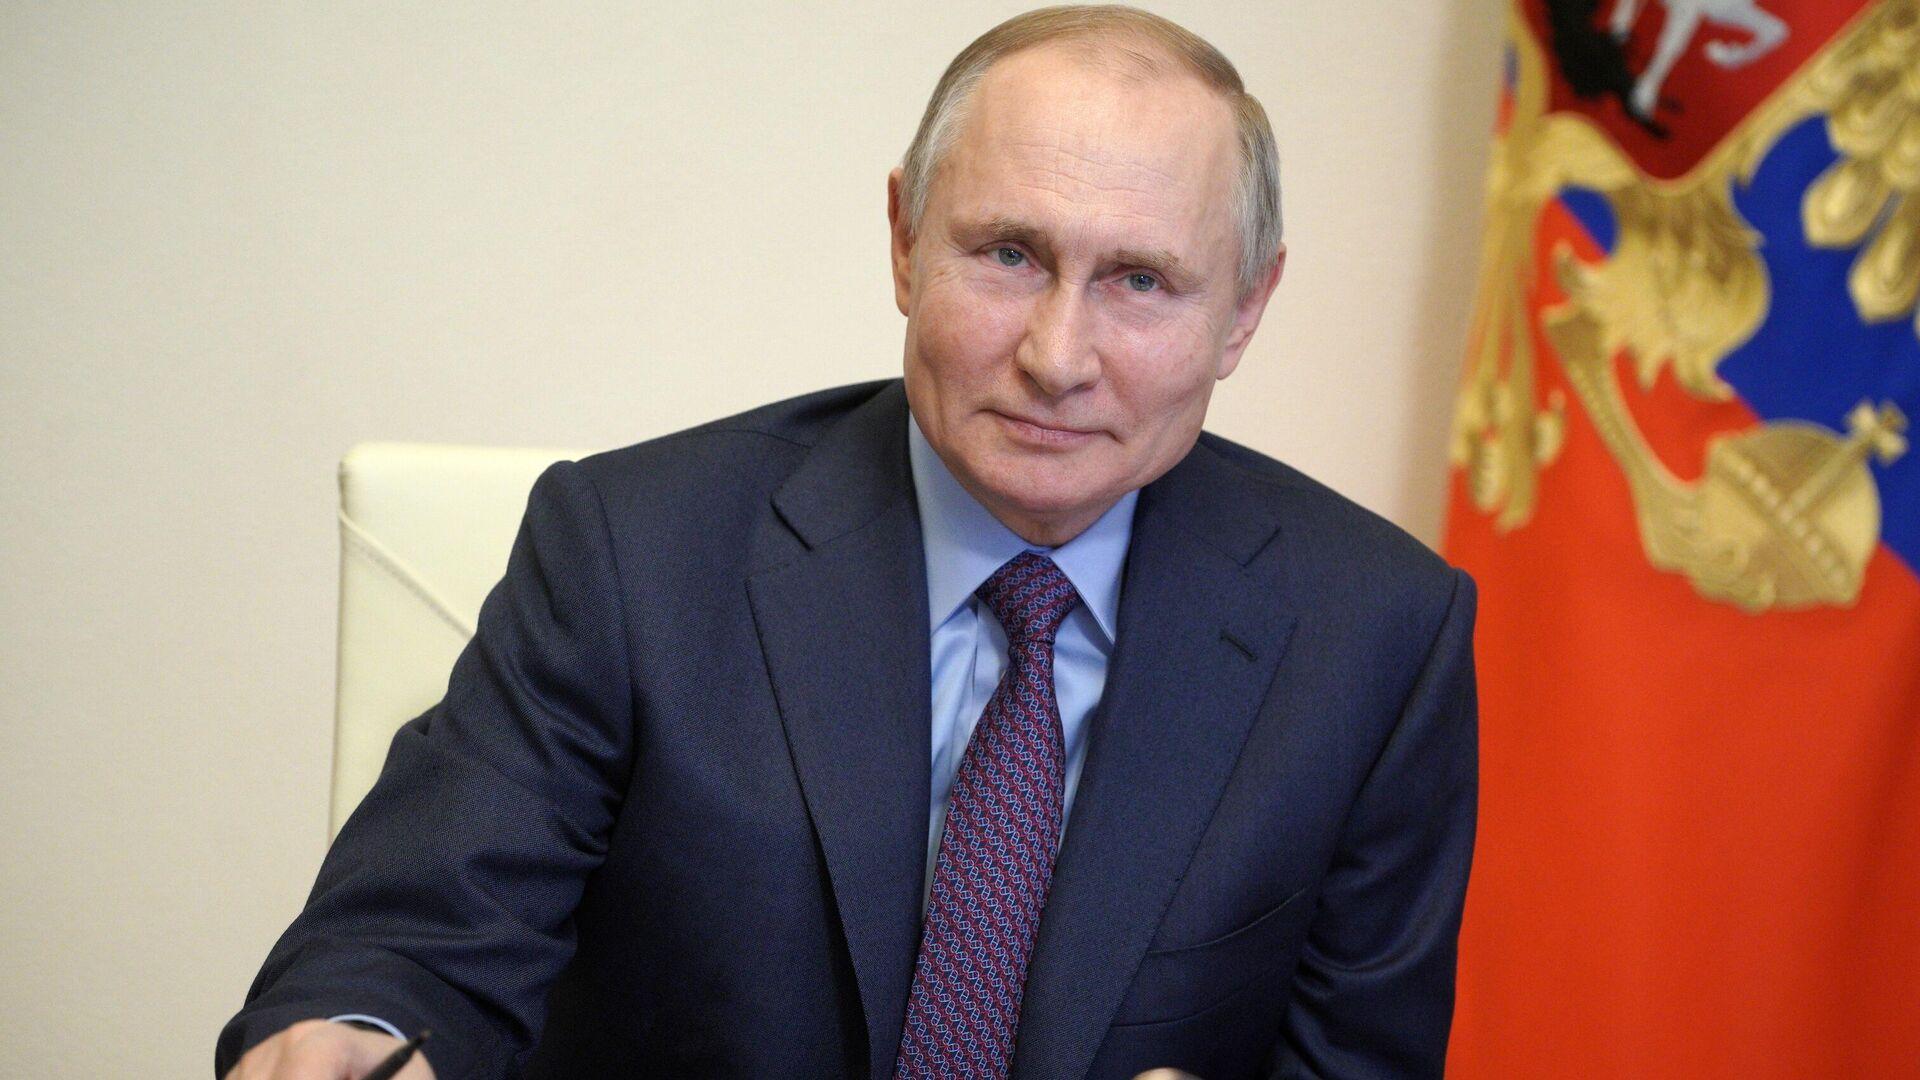 Vladímir Putin, presidente de Rusia - Sputnik Mundo, 1920, 05.04.2021